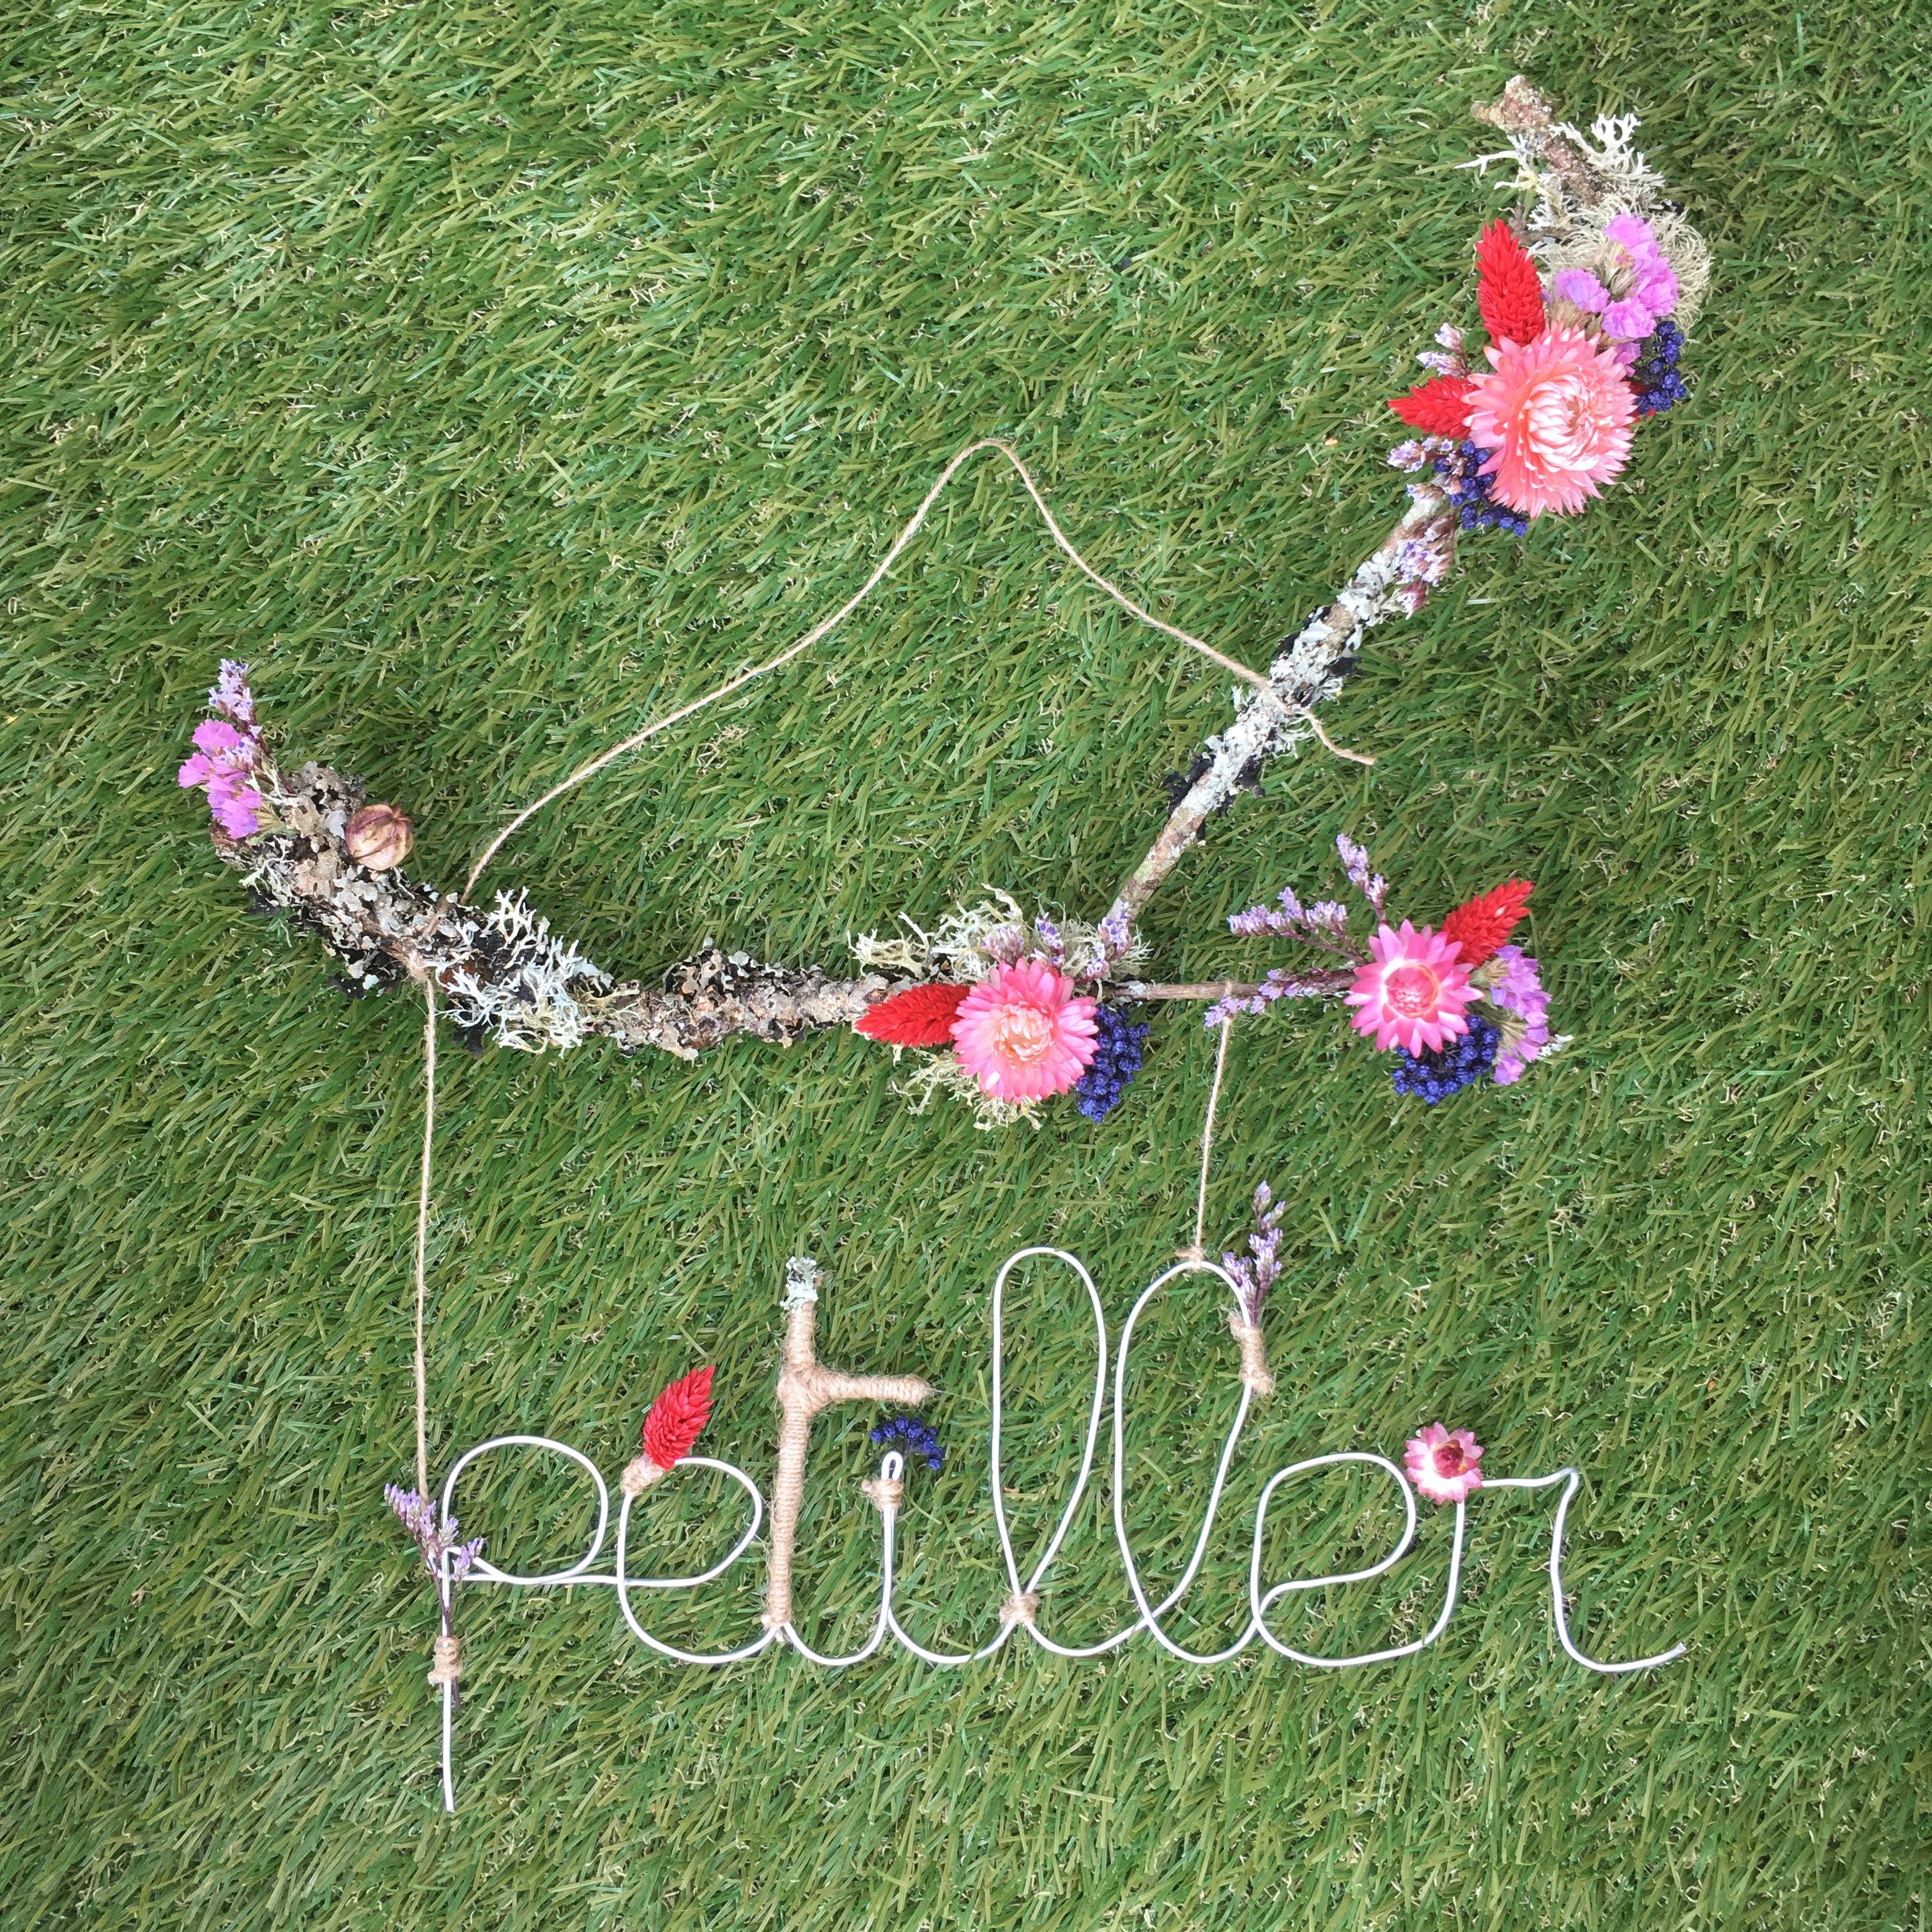 lebci création fleurs séchéess